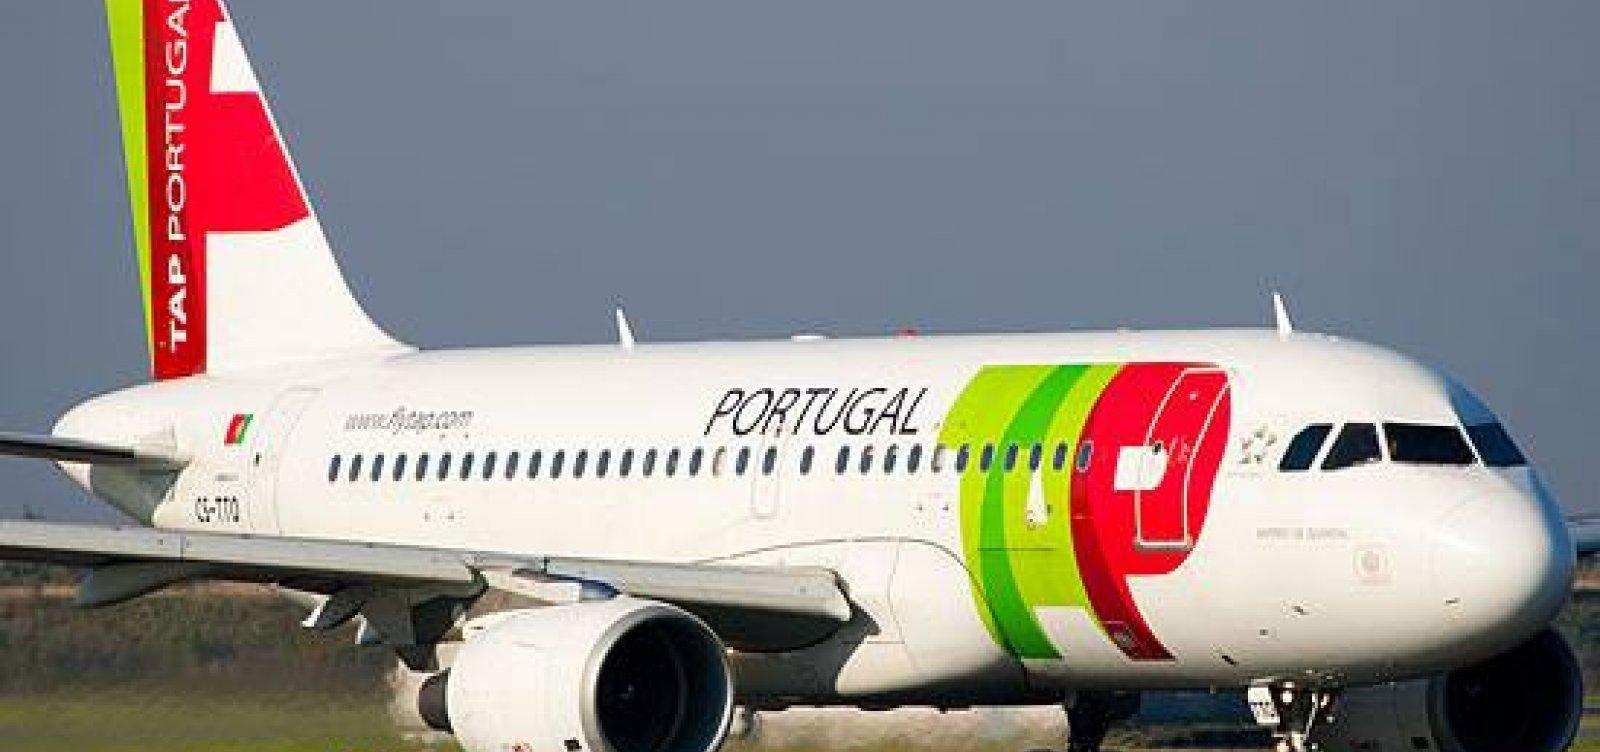 Rotas internacionais deixam de sair do aeroporto de Salvador